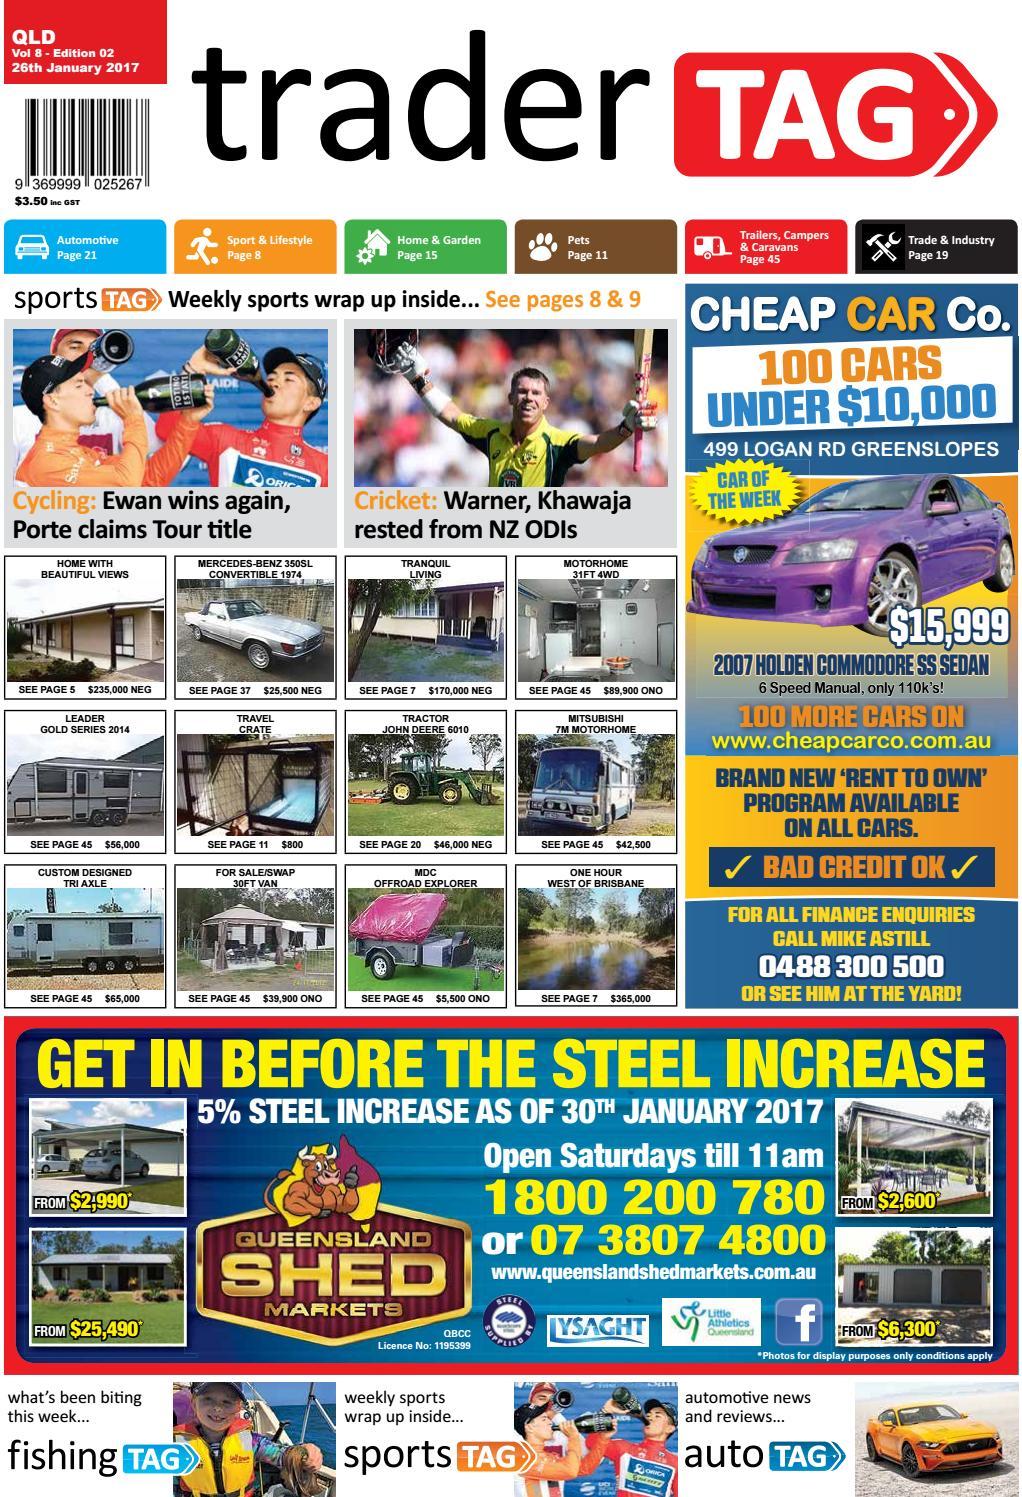 Tradertag Queensland Edition 02 2017 By Design Issuu Casio Baby G Ba 112 1a Hitam